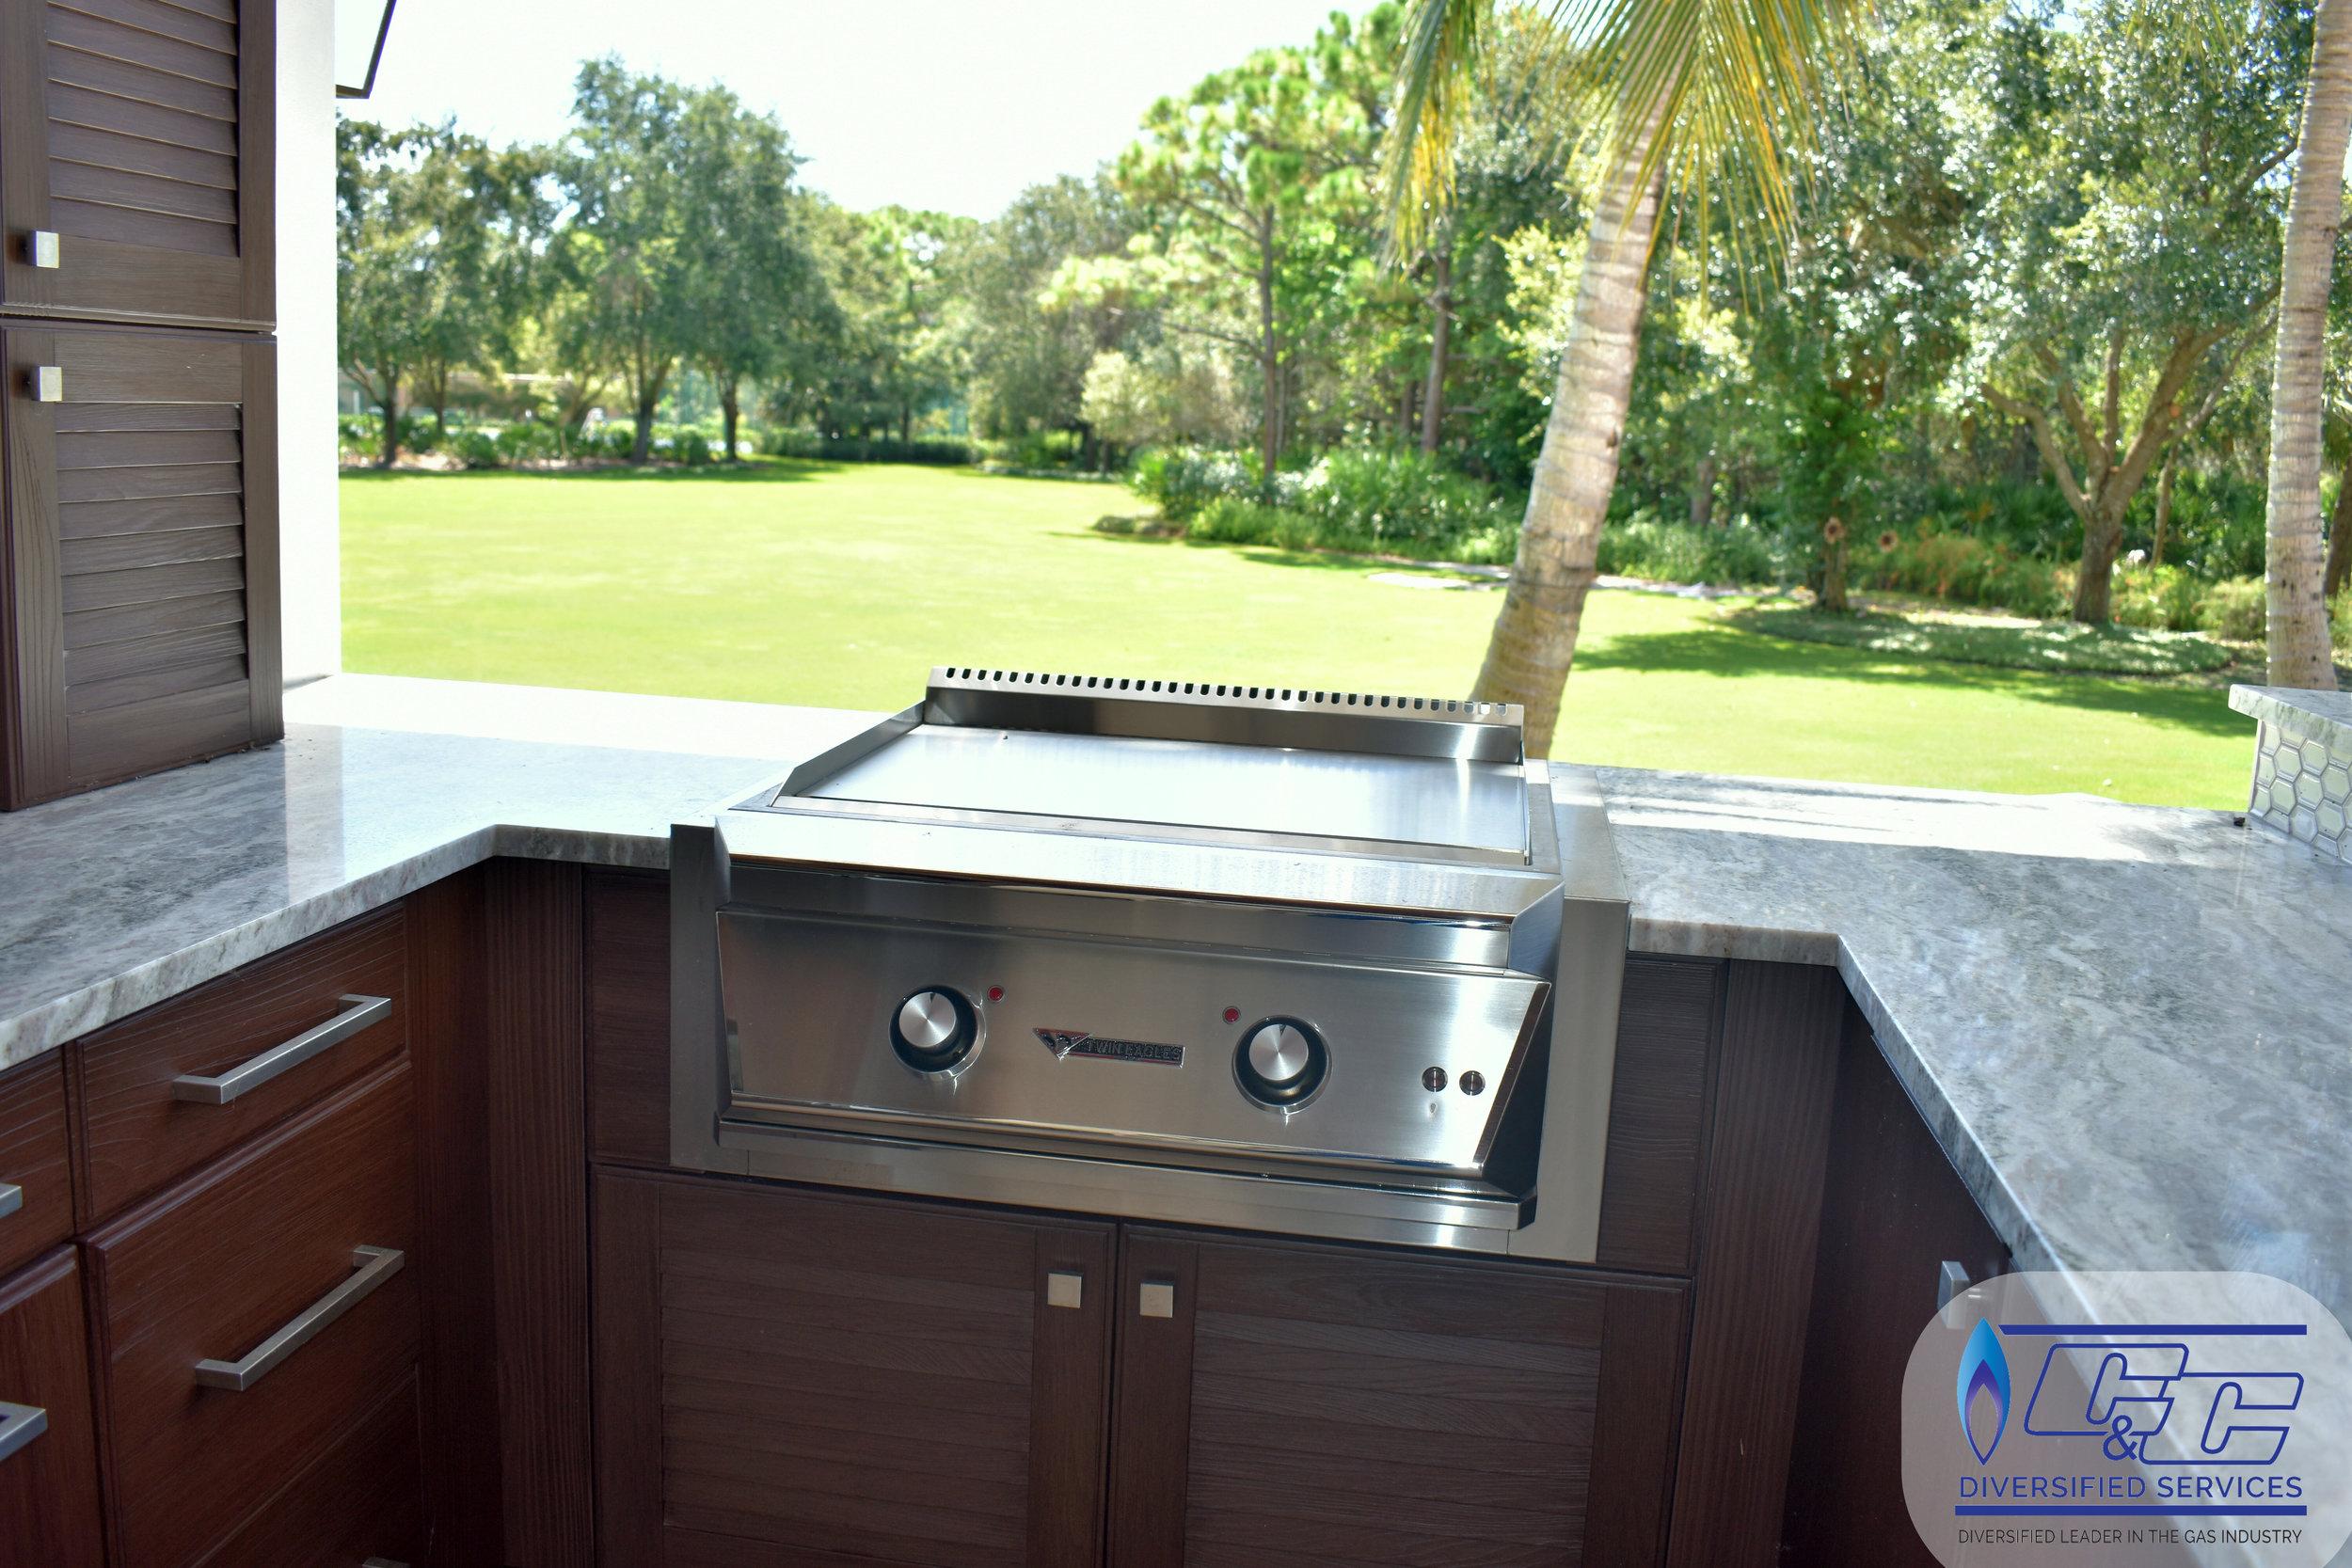 "NatureKast Weatherproof Cabinetry - 30"" Twin Eagles Teppanyaki Grill"